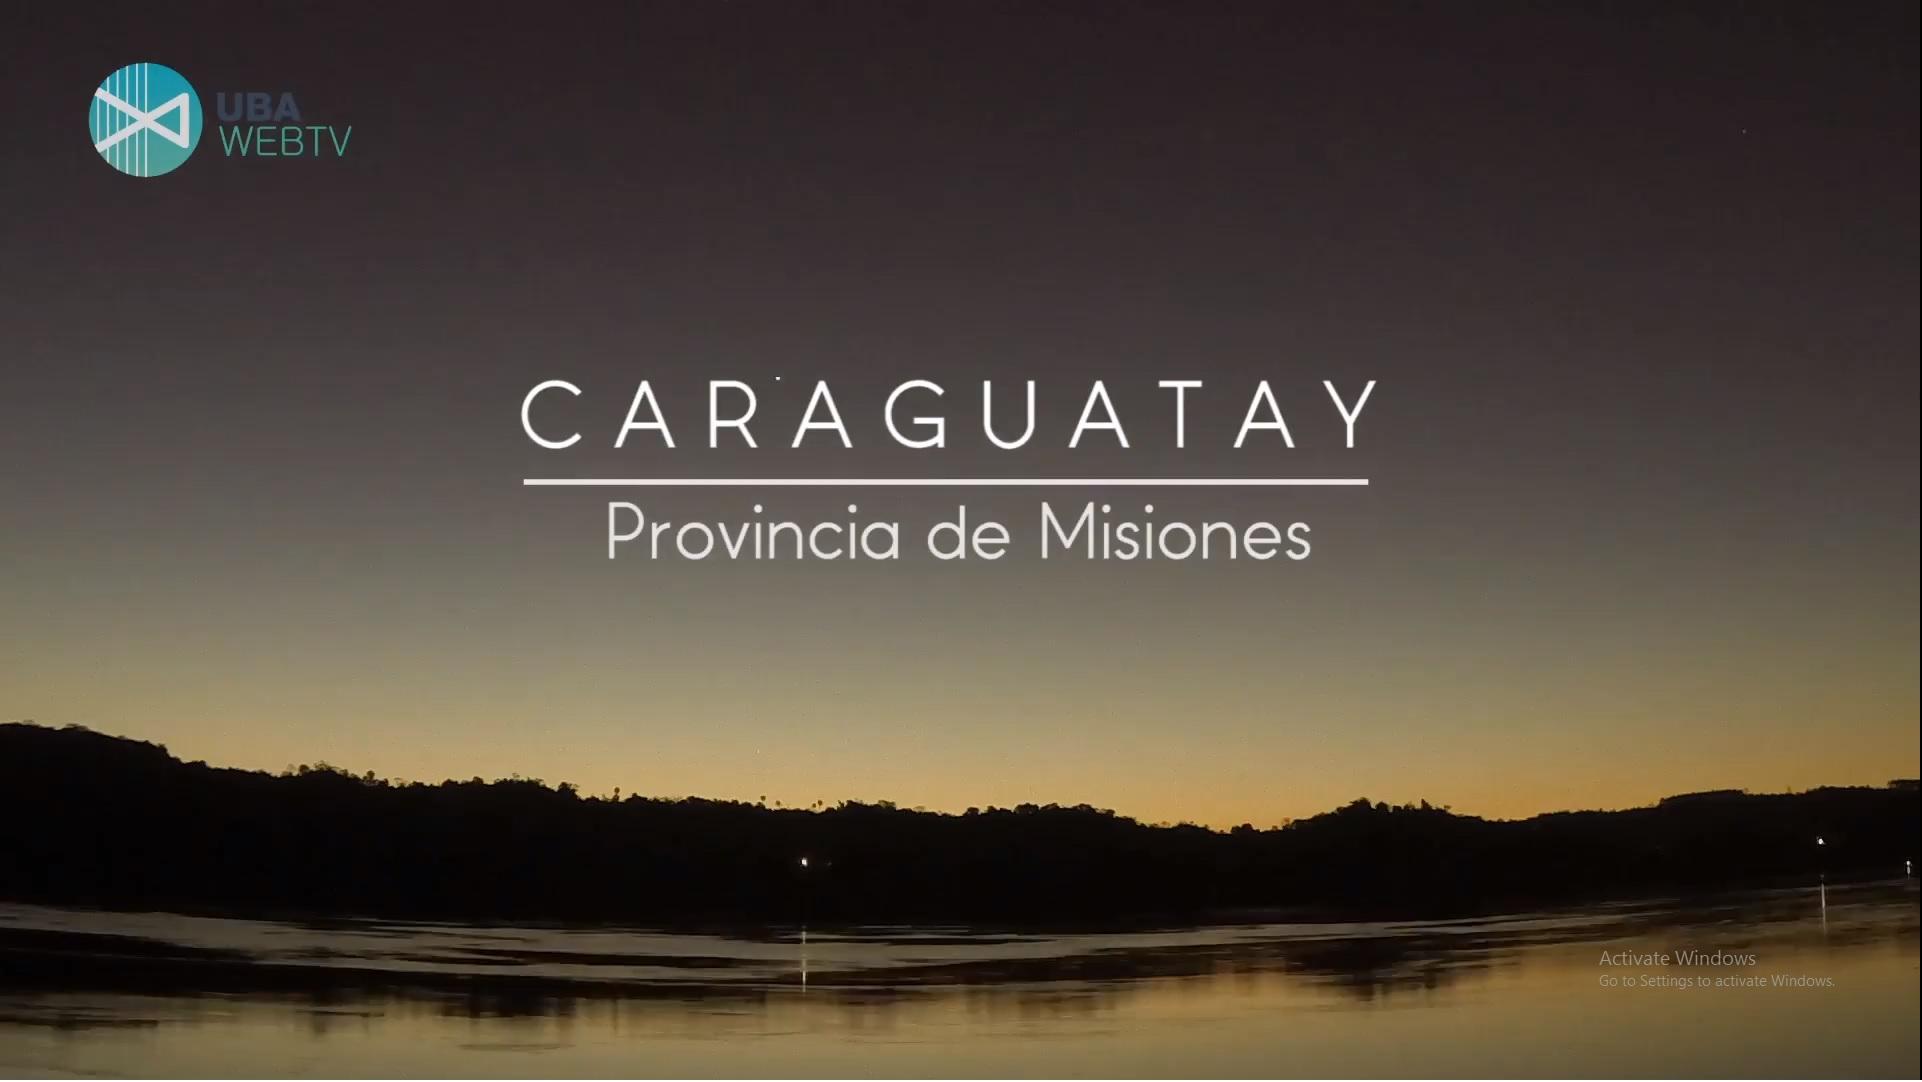 PROYECTO SOCIAL: Caraguatay, Odontología